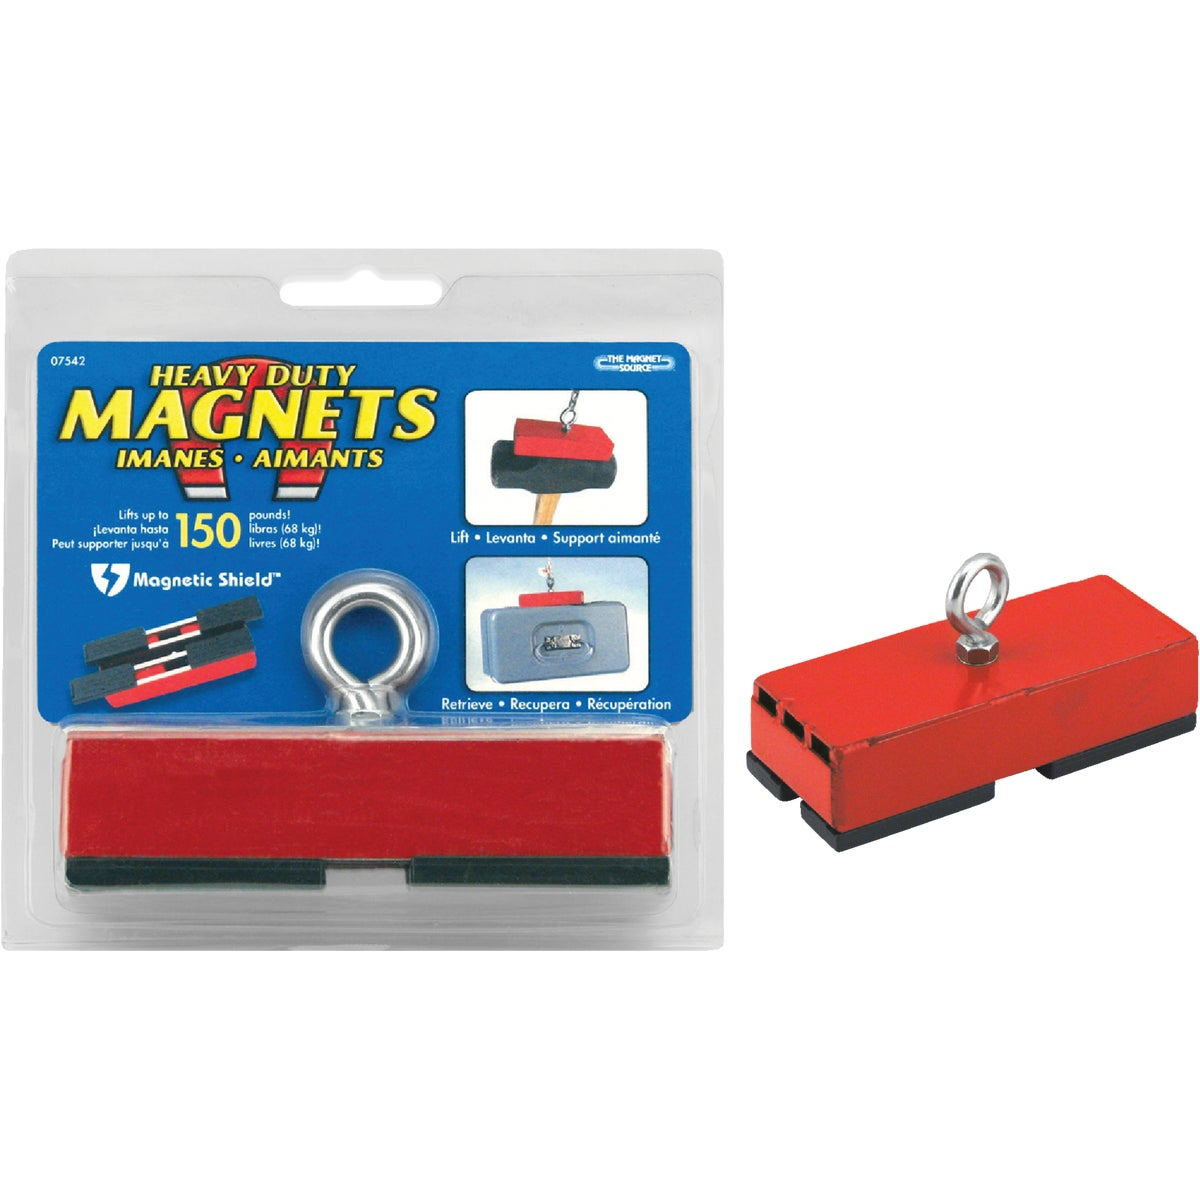 150LB RETRIEVING MAGNET - 07542 by Master Magnetics